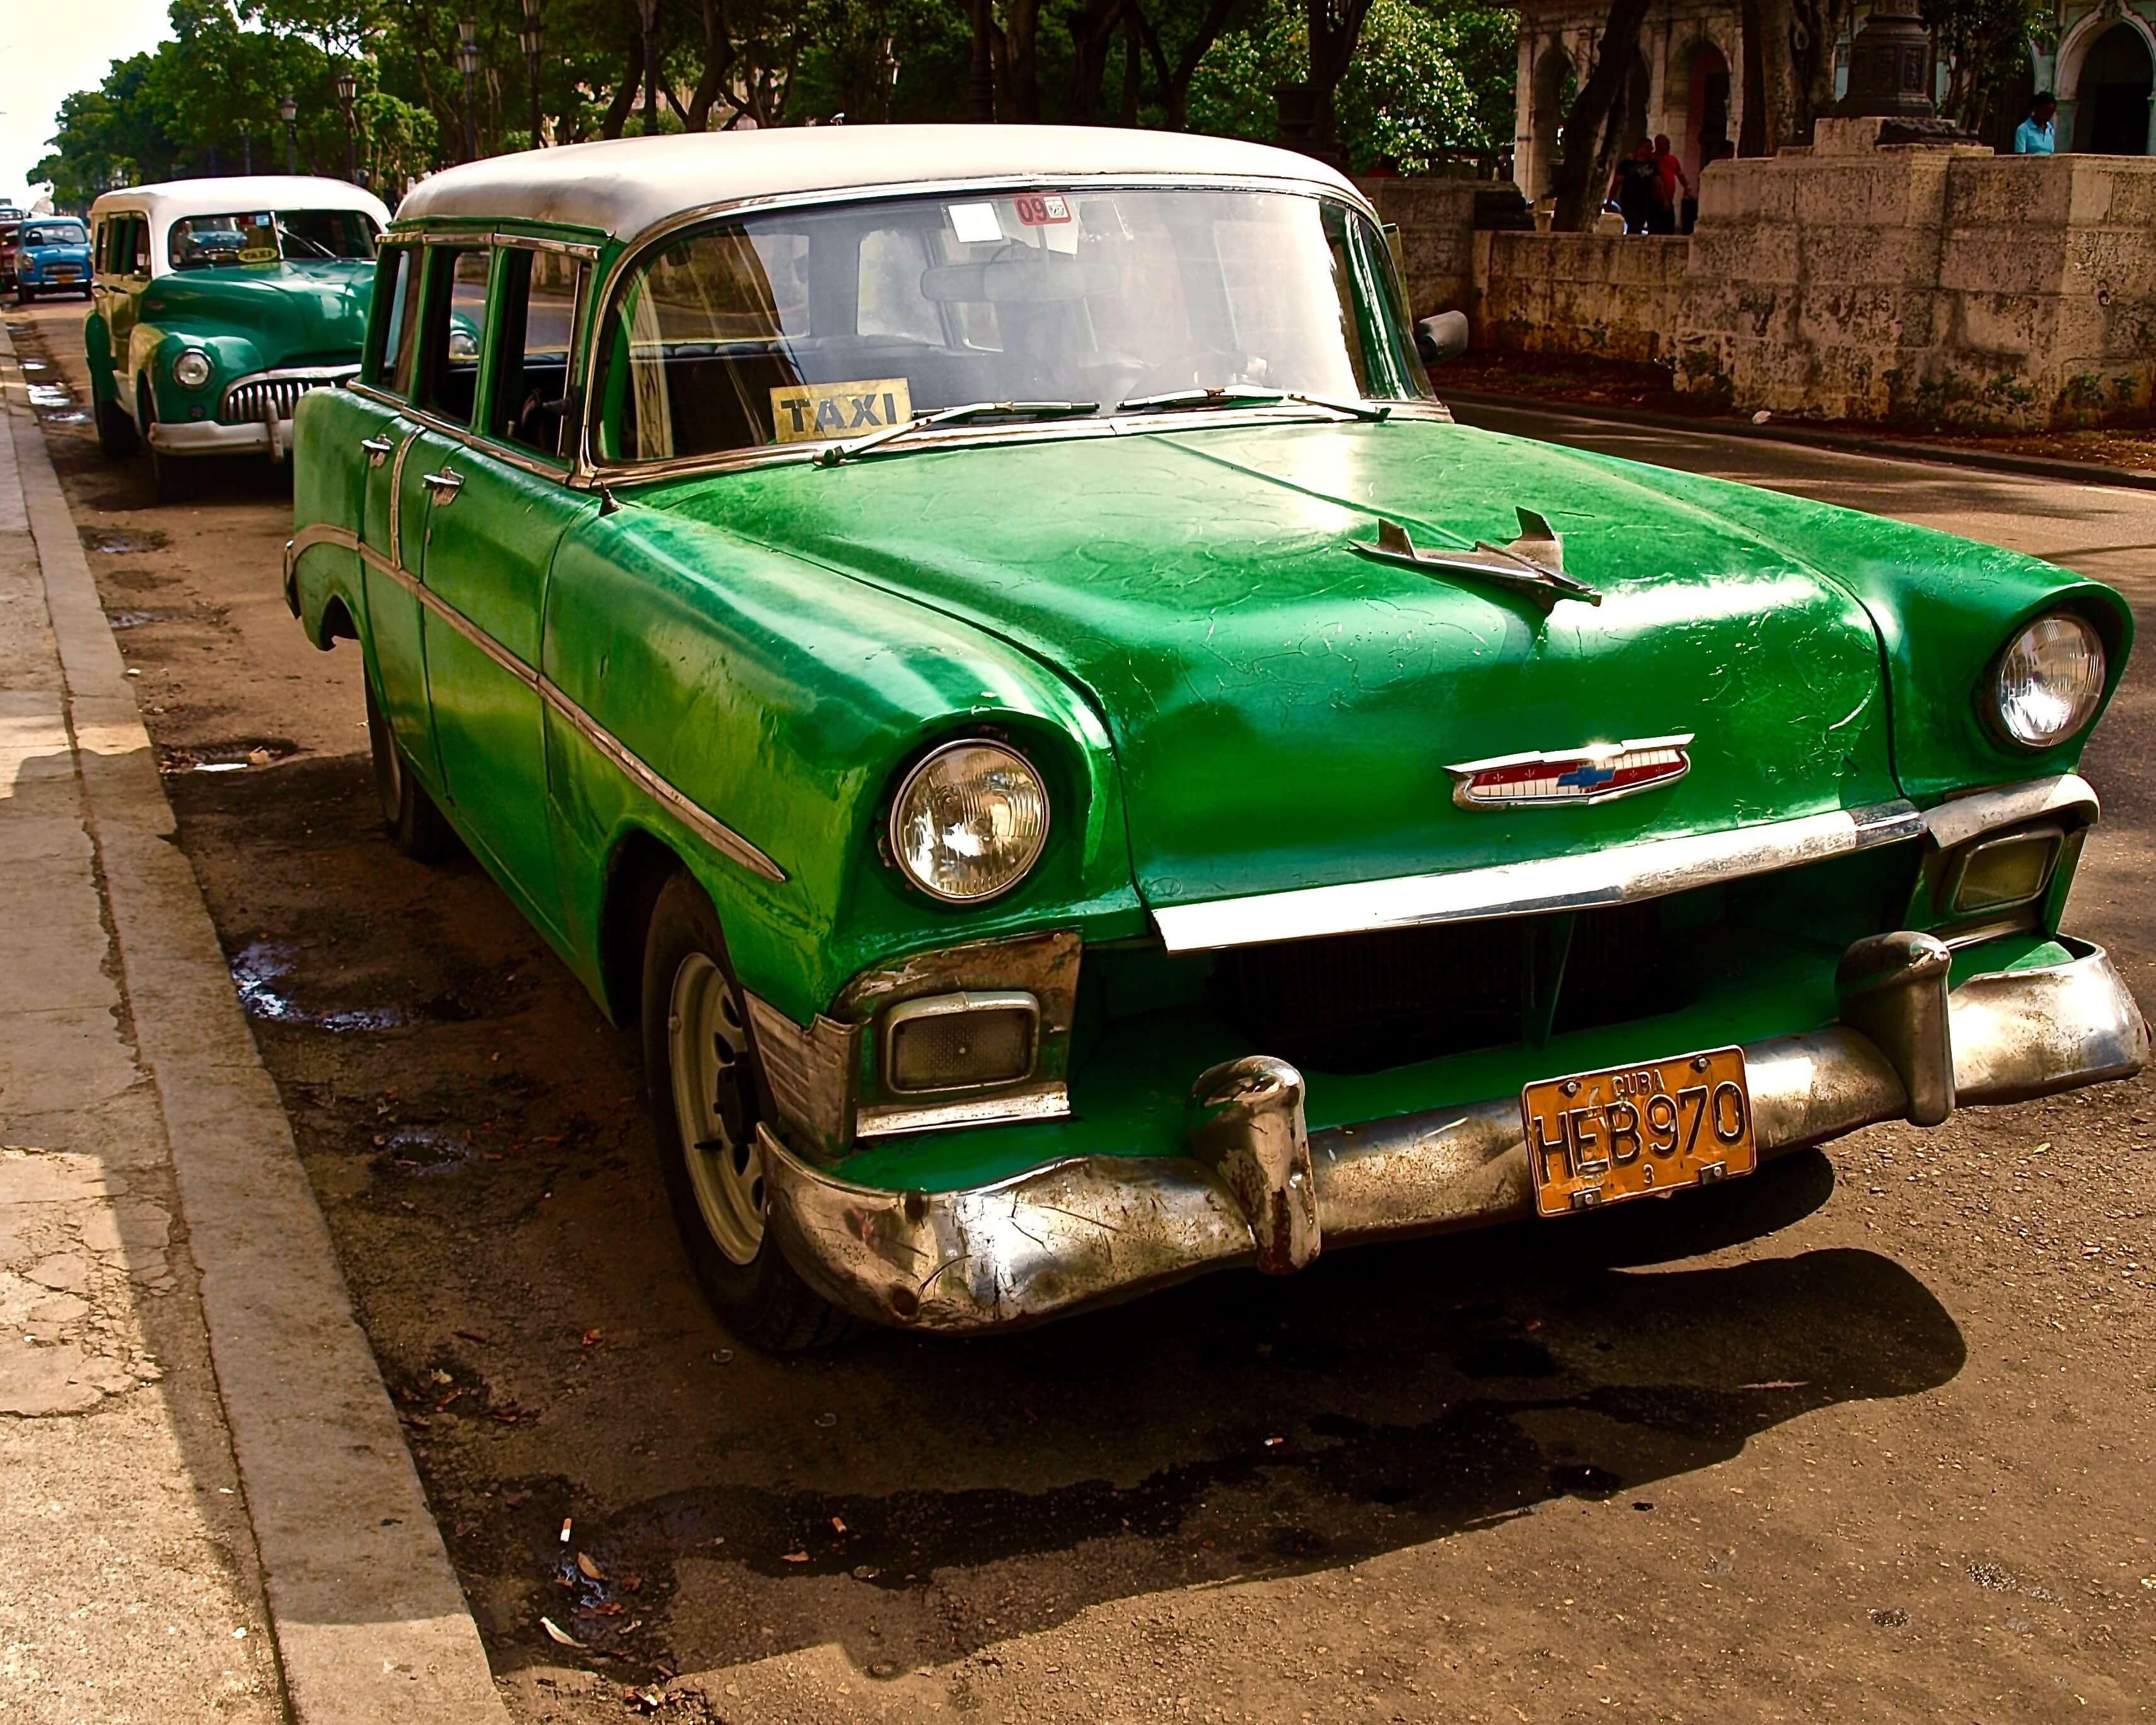 A green taxi in cuba.